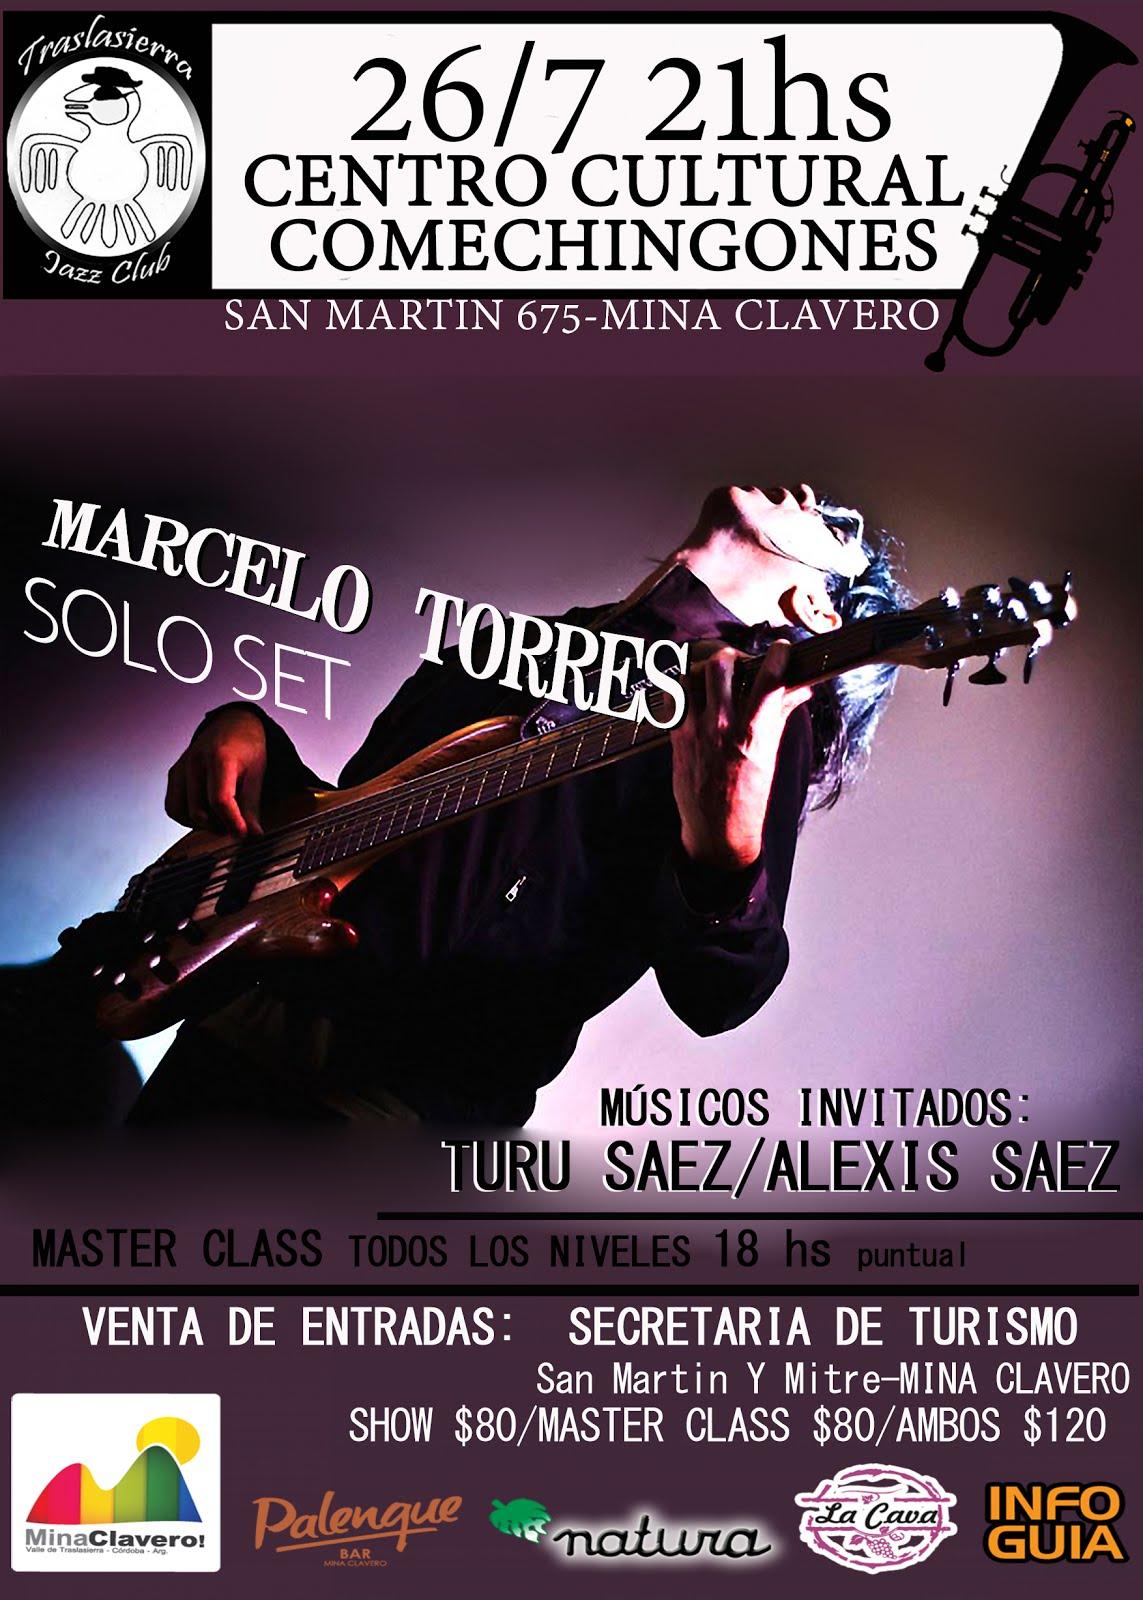 MARCELO TORRES SOLO SET EN MINA CLAVERO